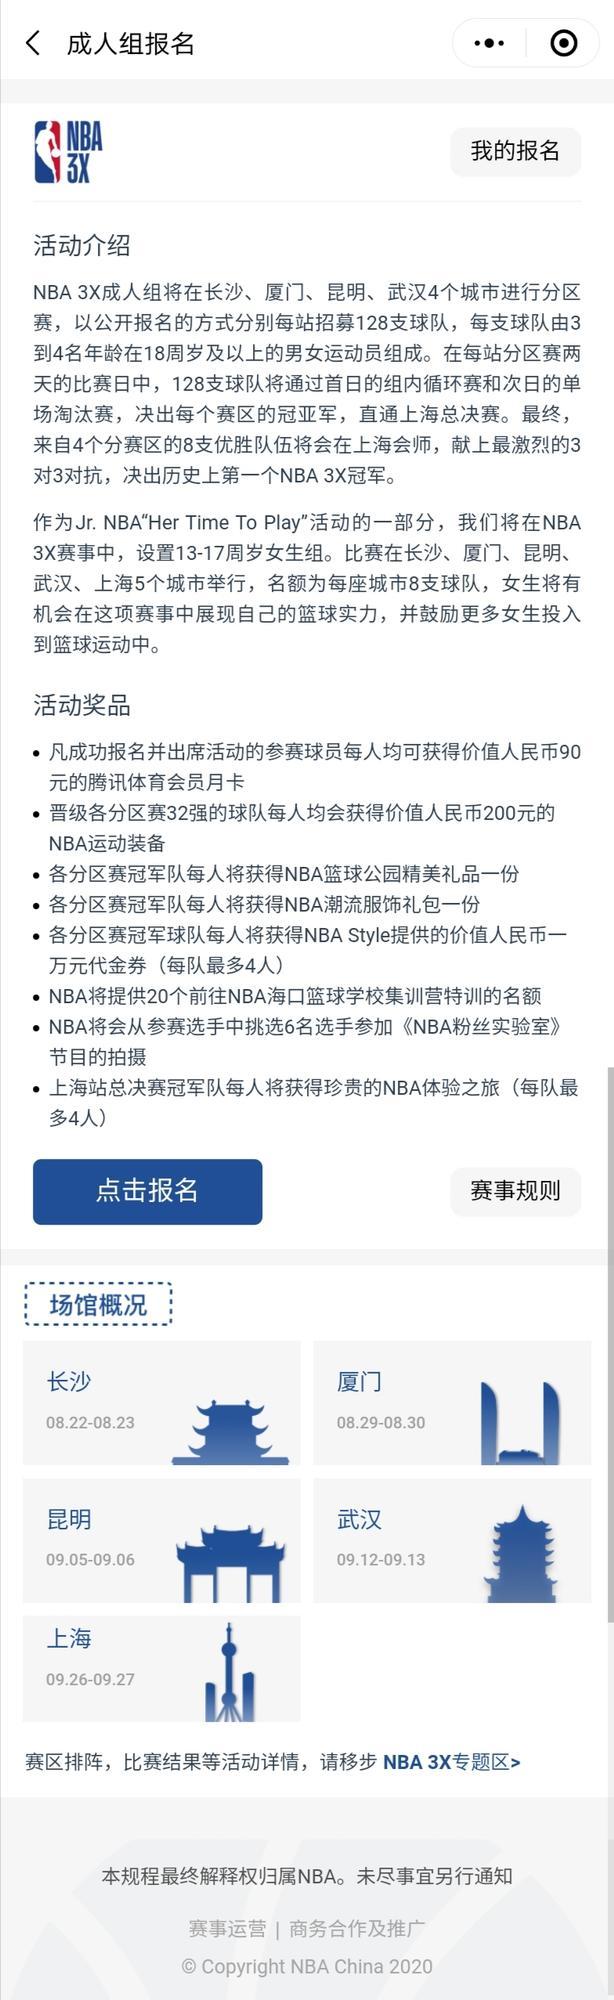 #NBA 3X# 招募令!